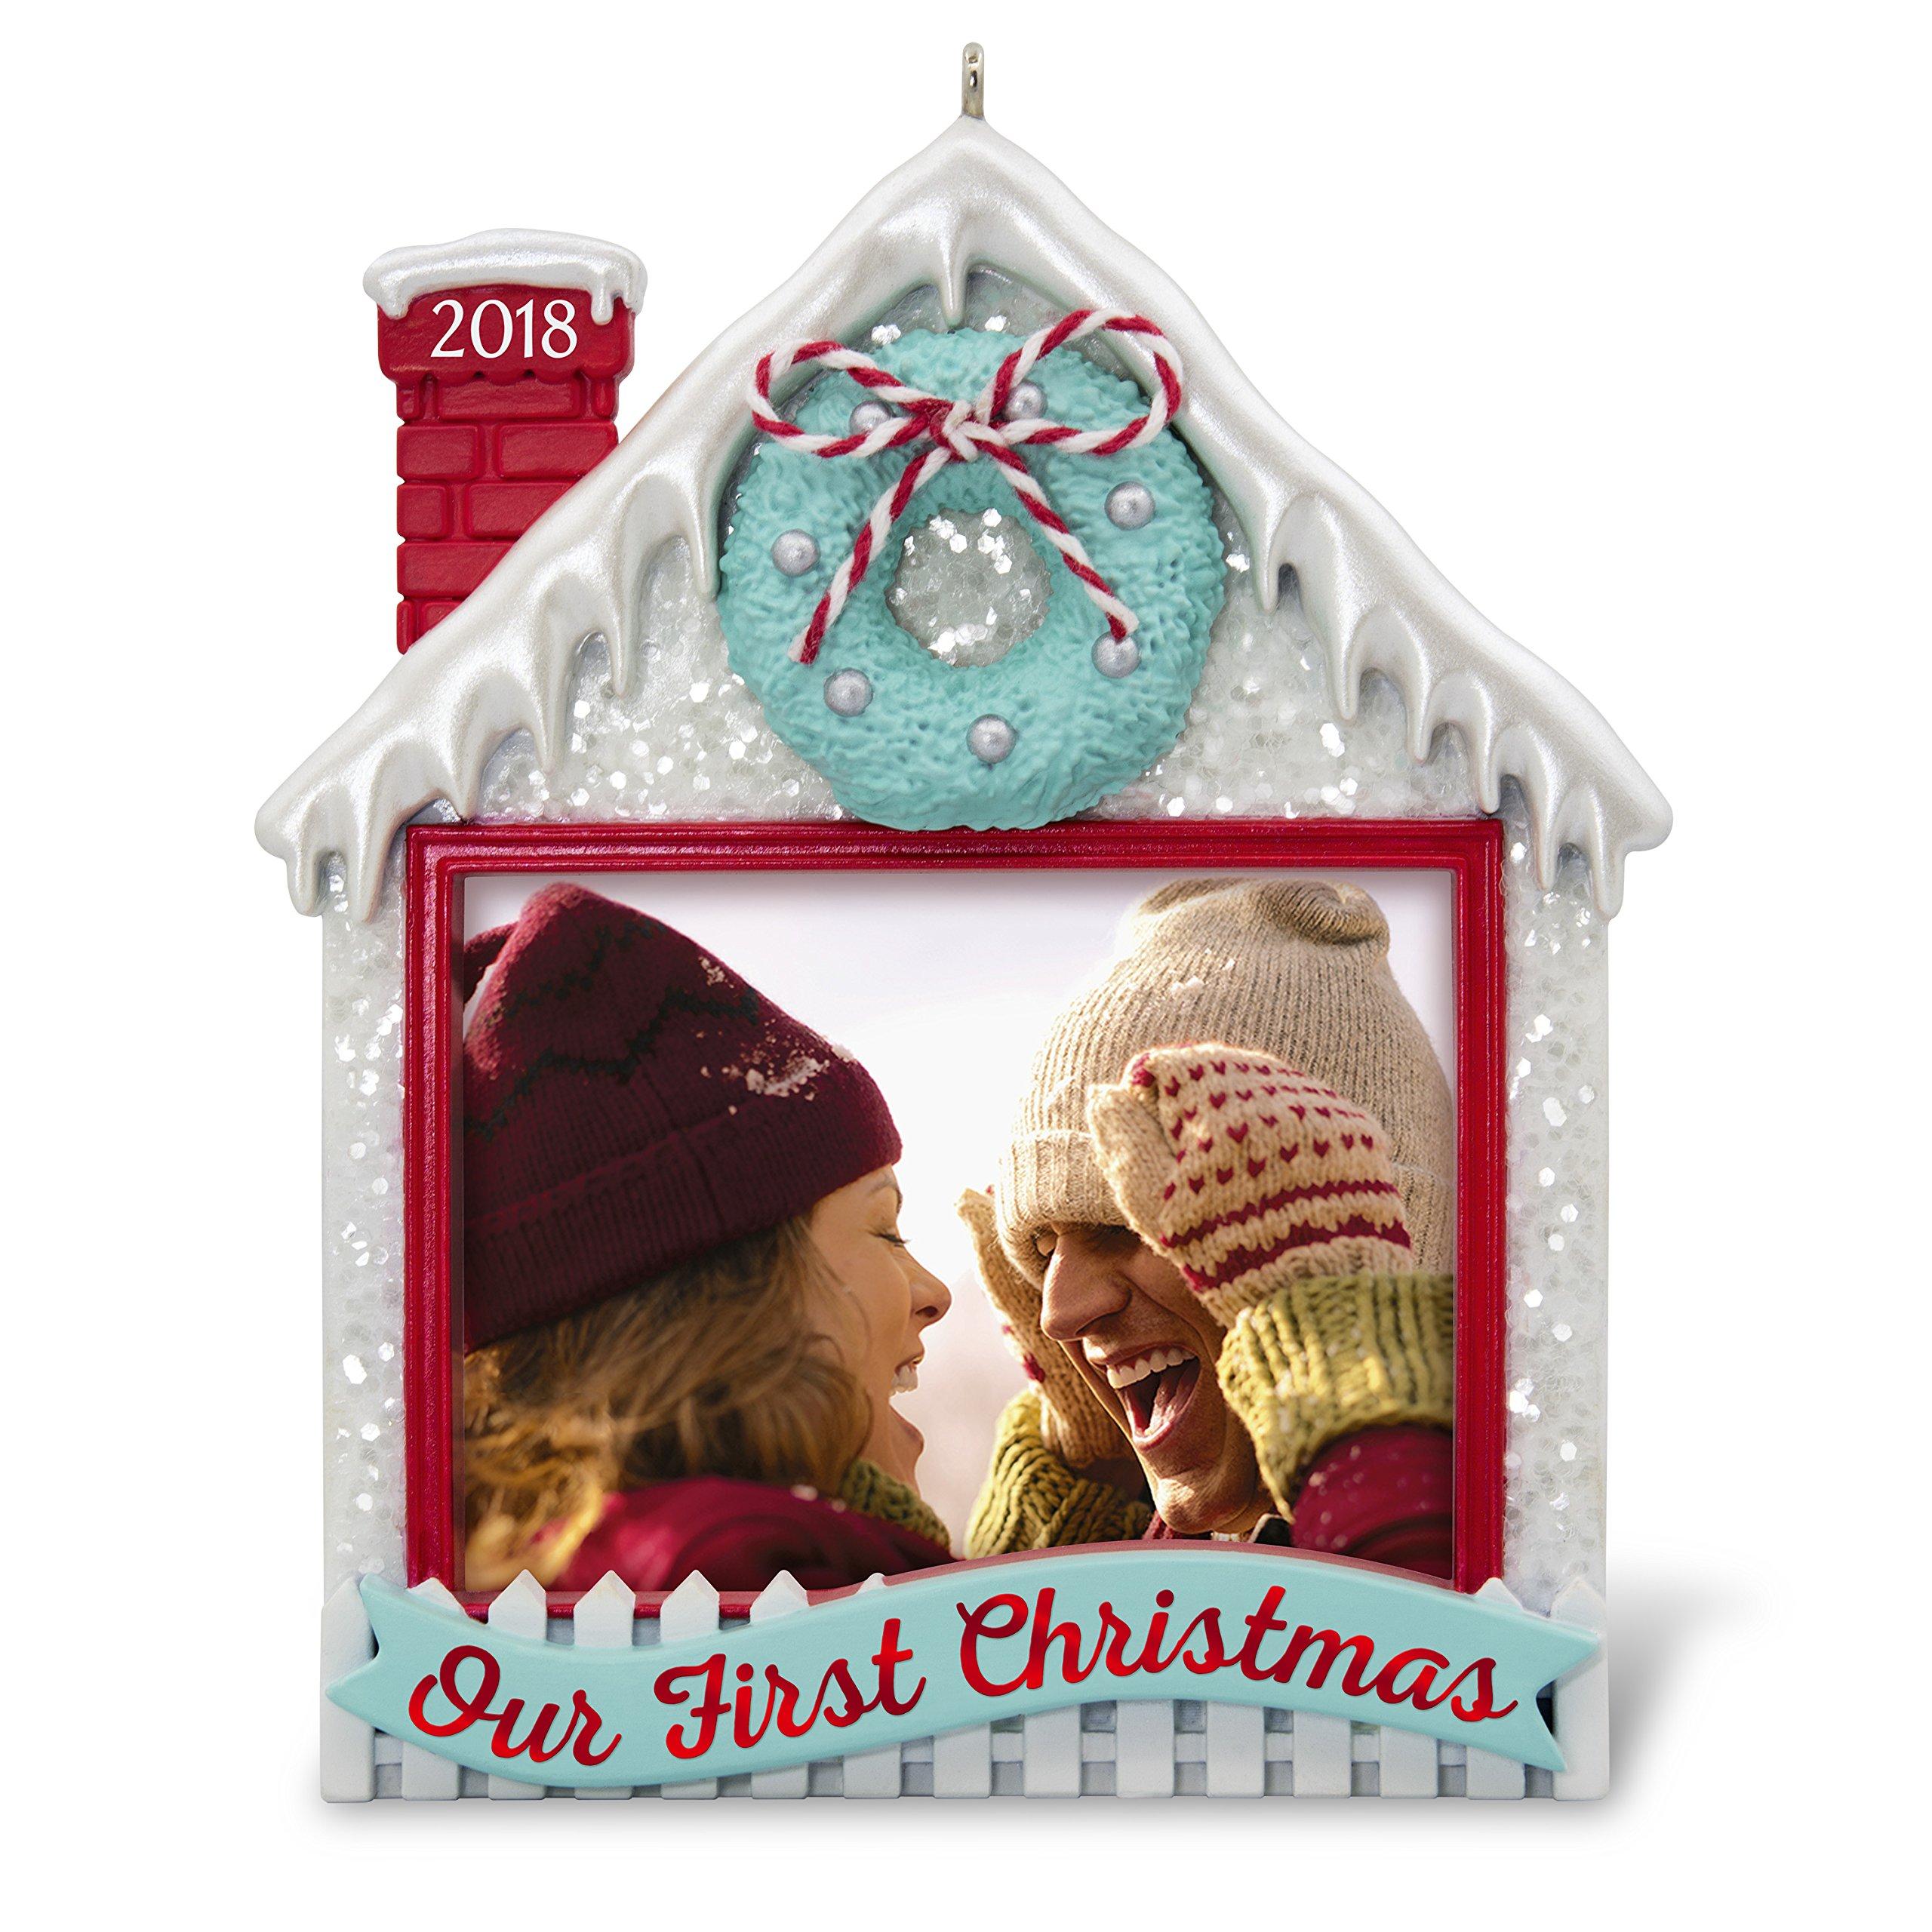 Hallmark 2018 Our First Christmas Photo Holder Ornament ...